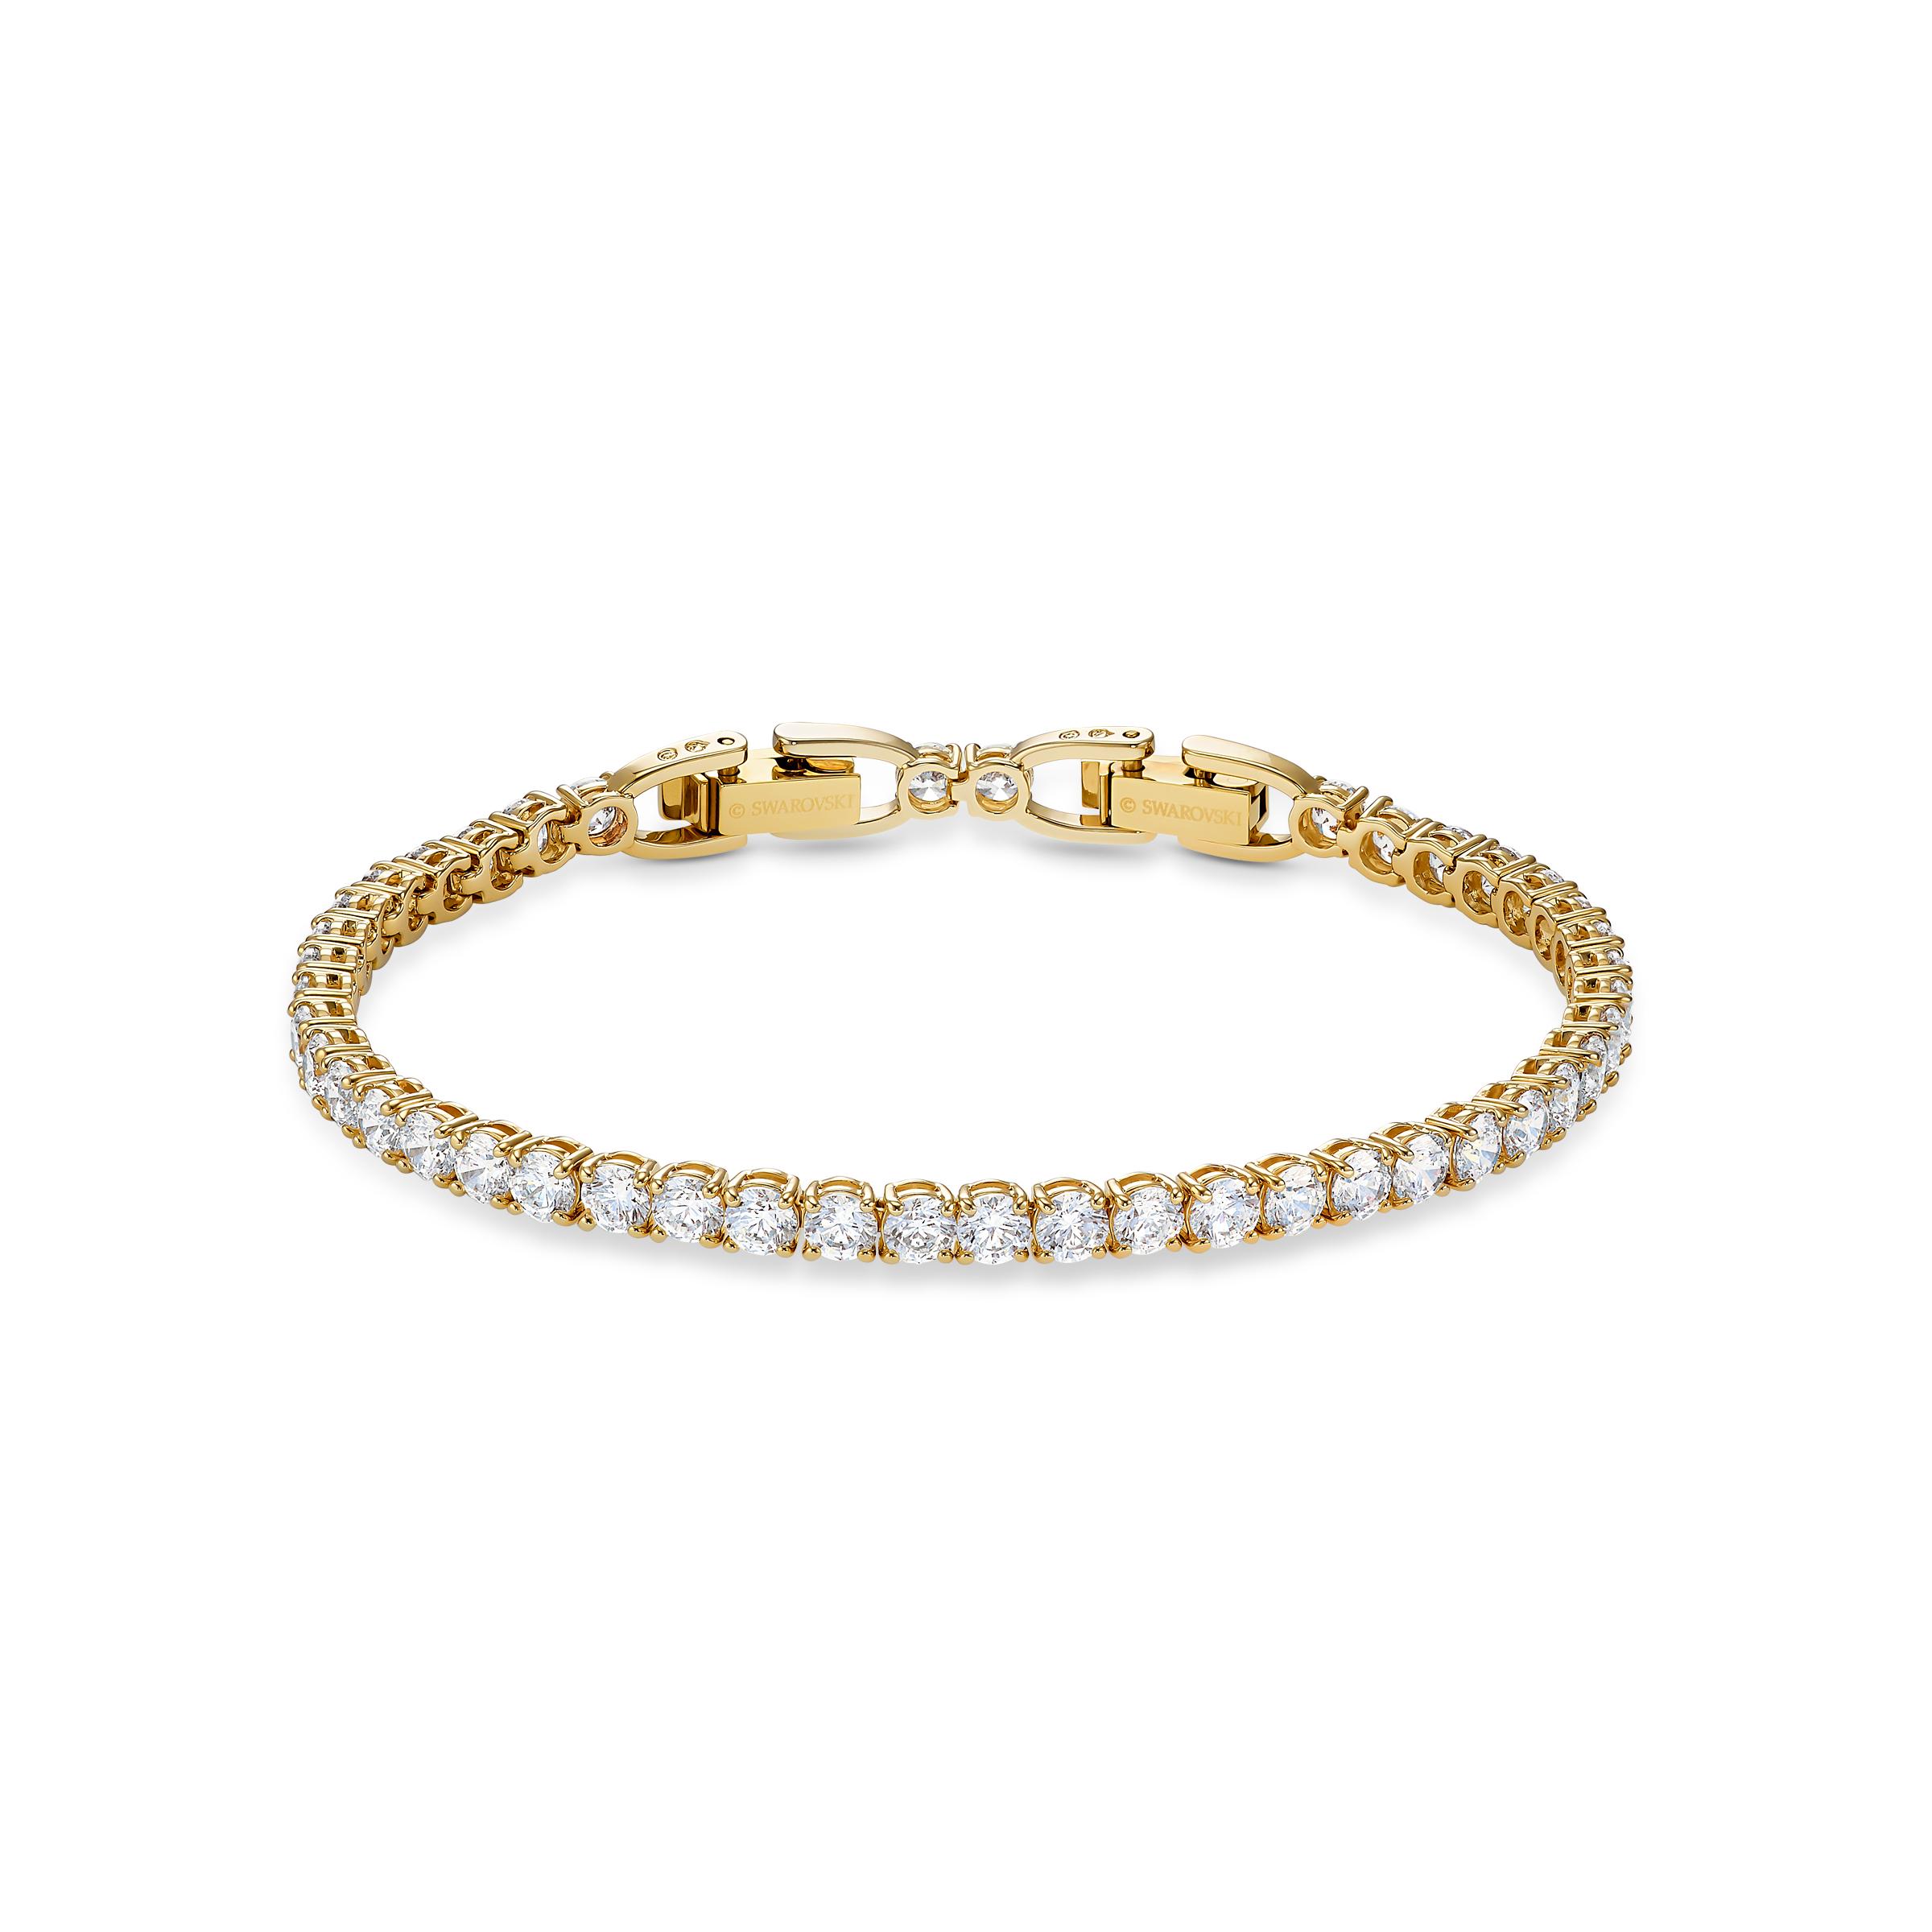 Bracelet Tennis Deluxe, blanc, métal doré, Swarovski